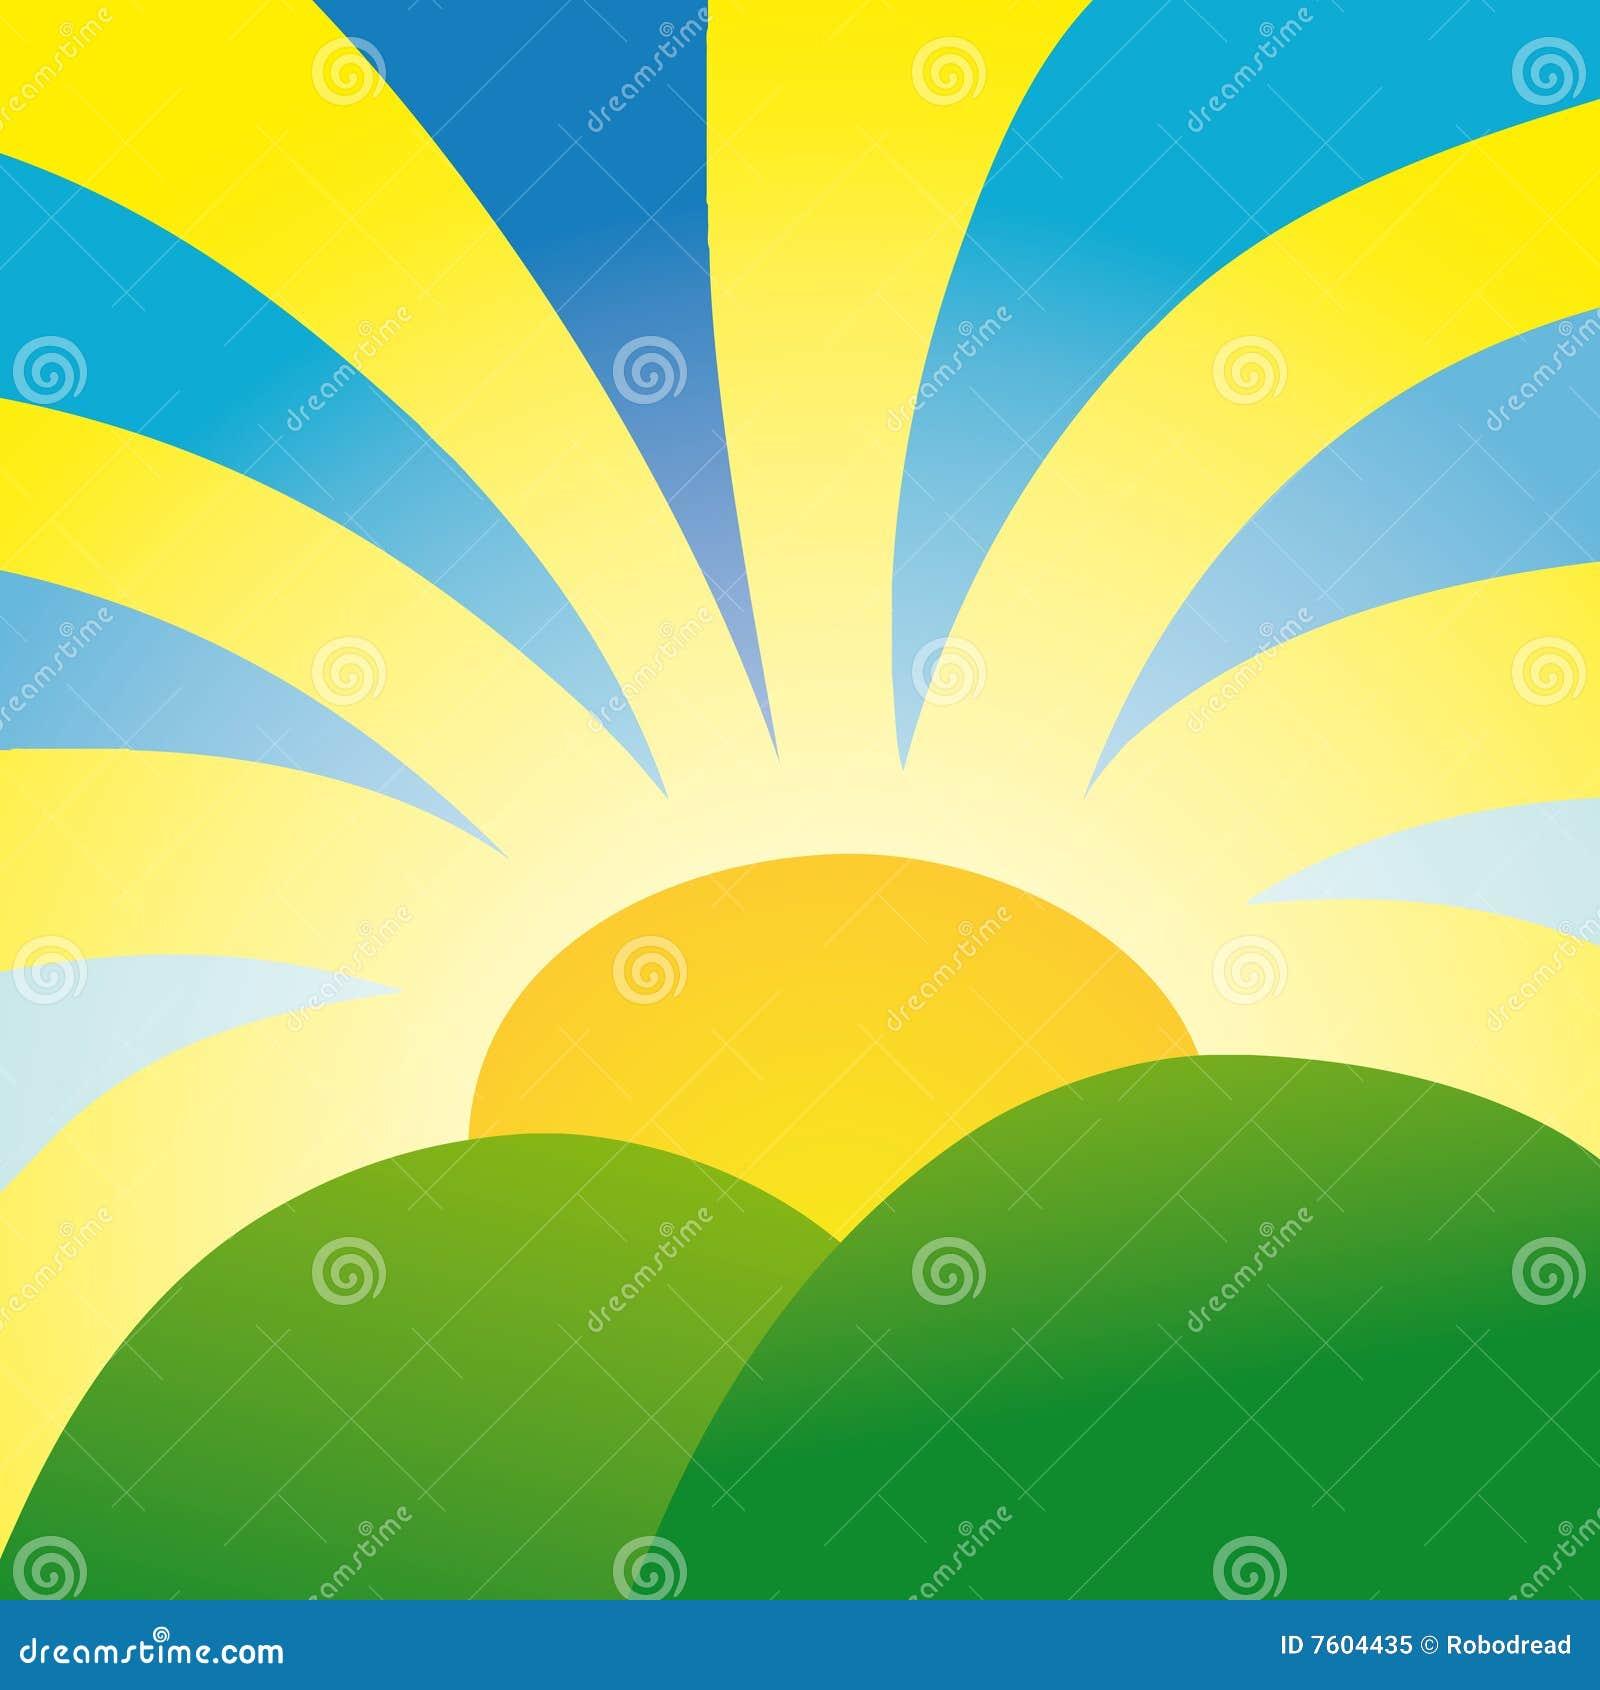 Rays of sunshine (vector) stock vector. Illustration of ... (1300 x 1390 Pixel)